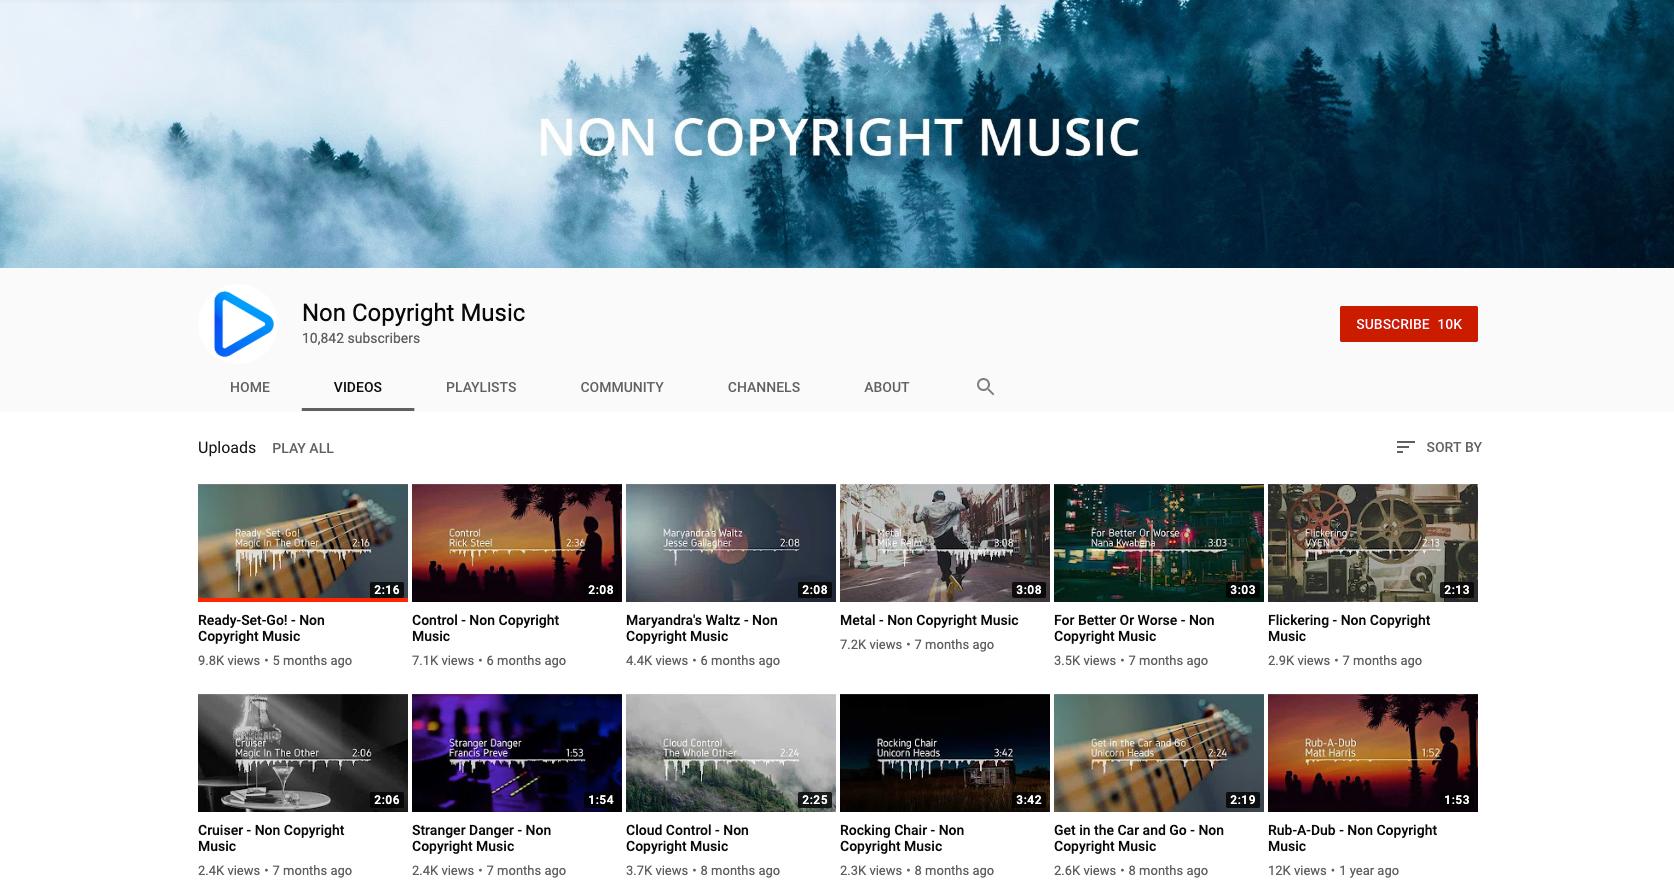 youtube-non-copyright-music